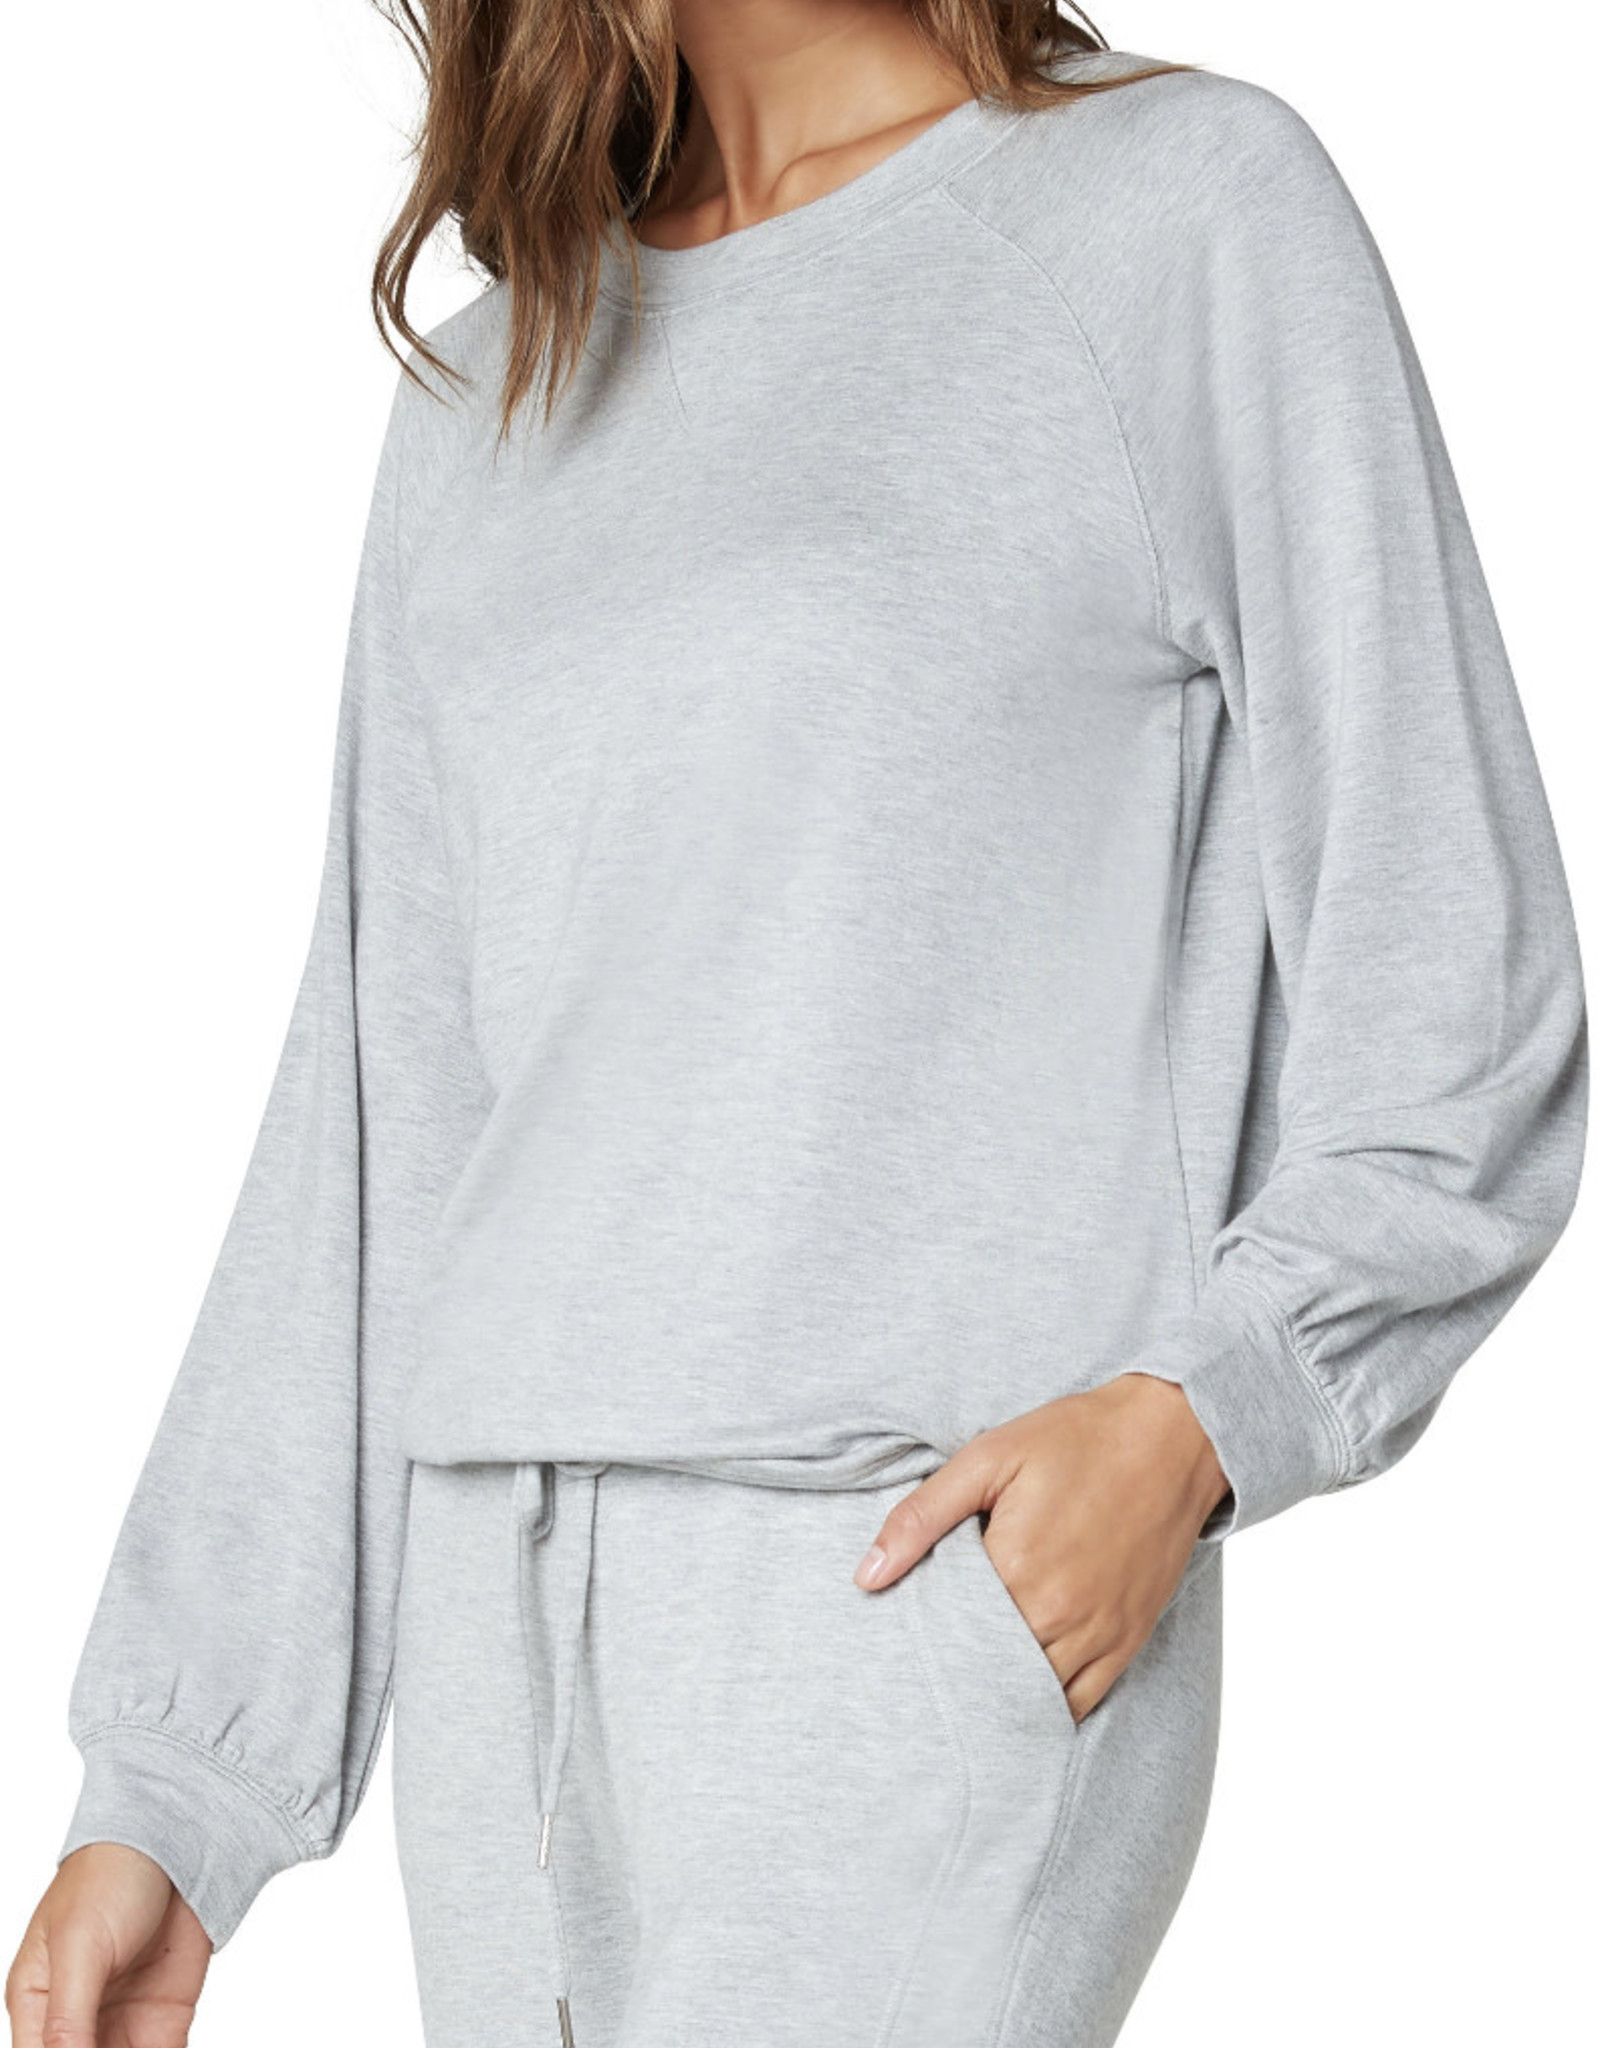 Liverpool Raglan pullover